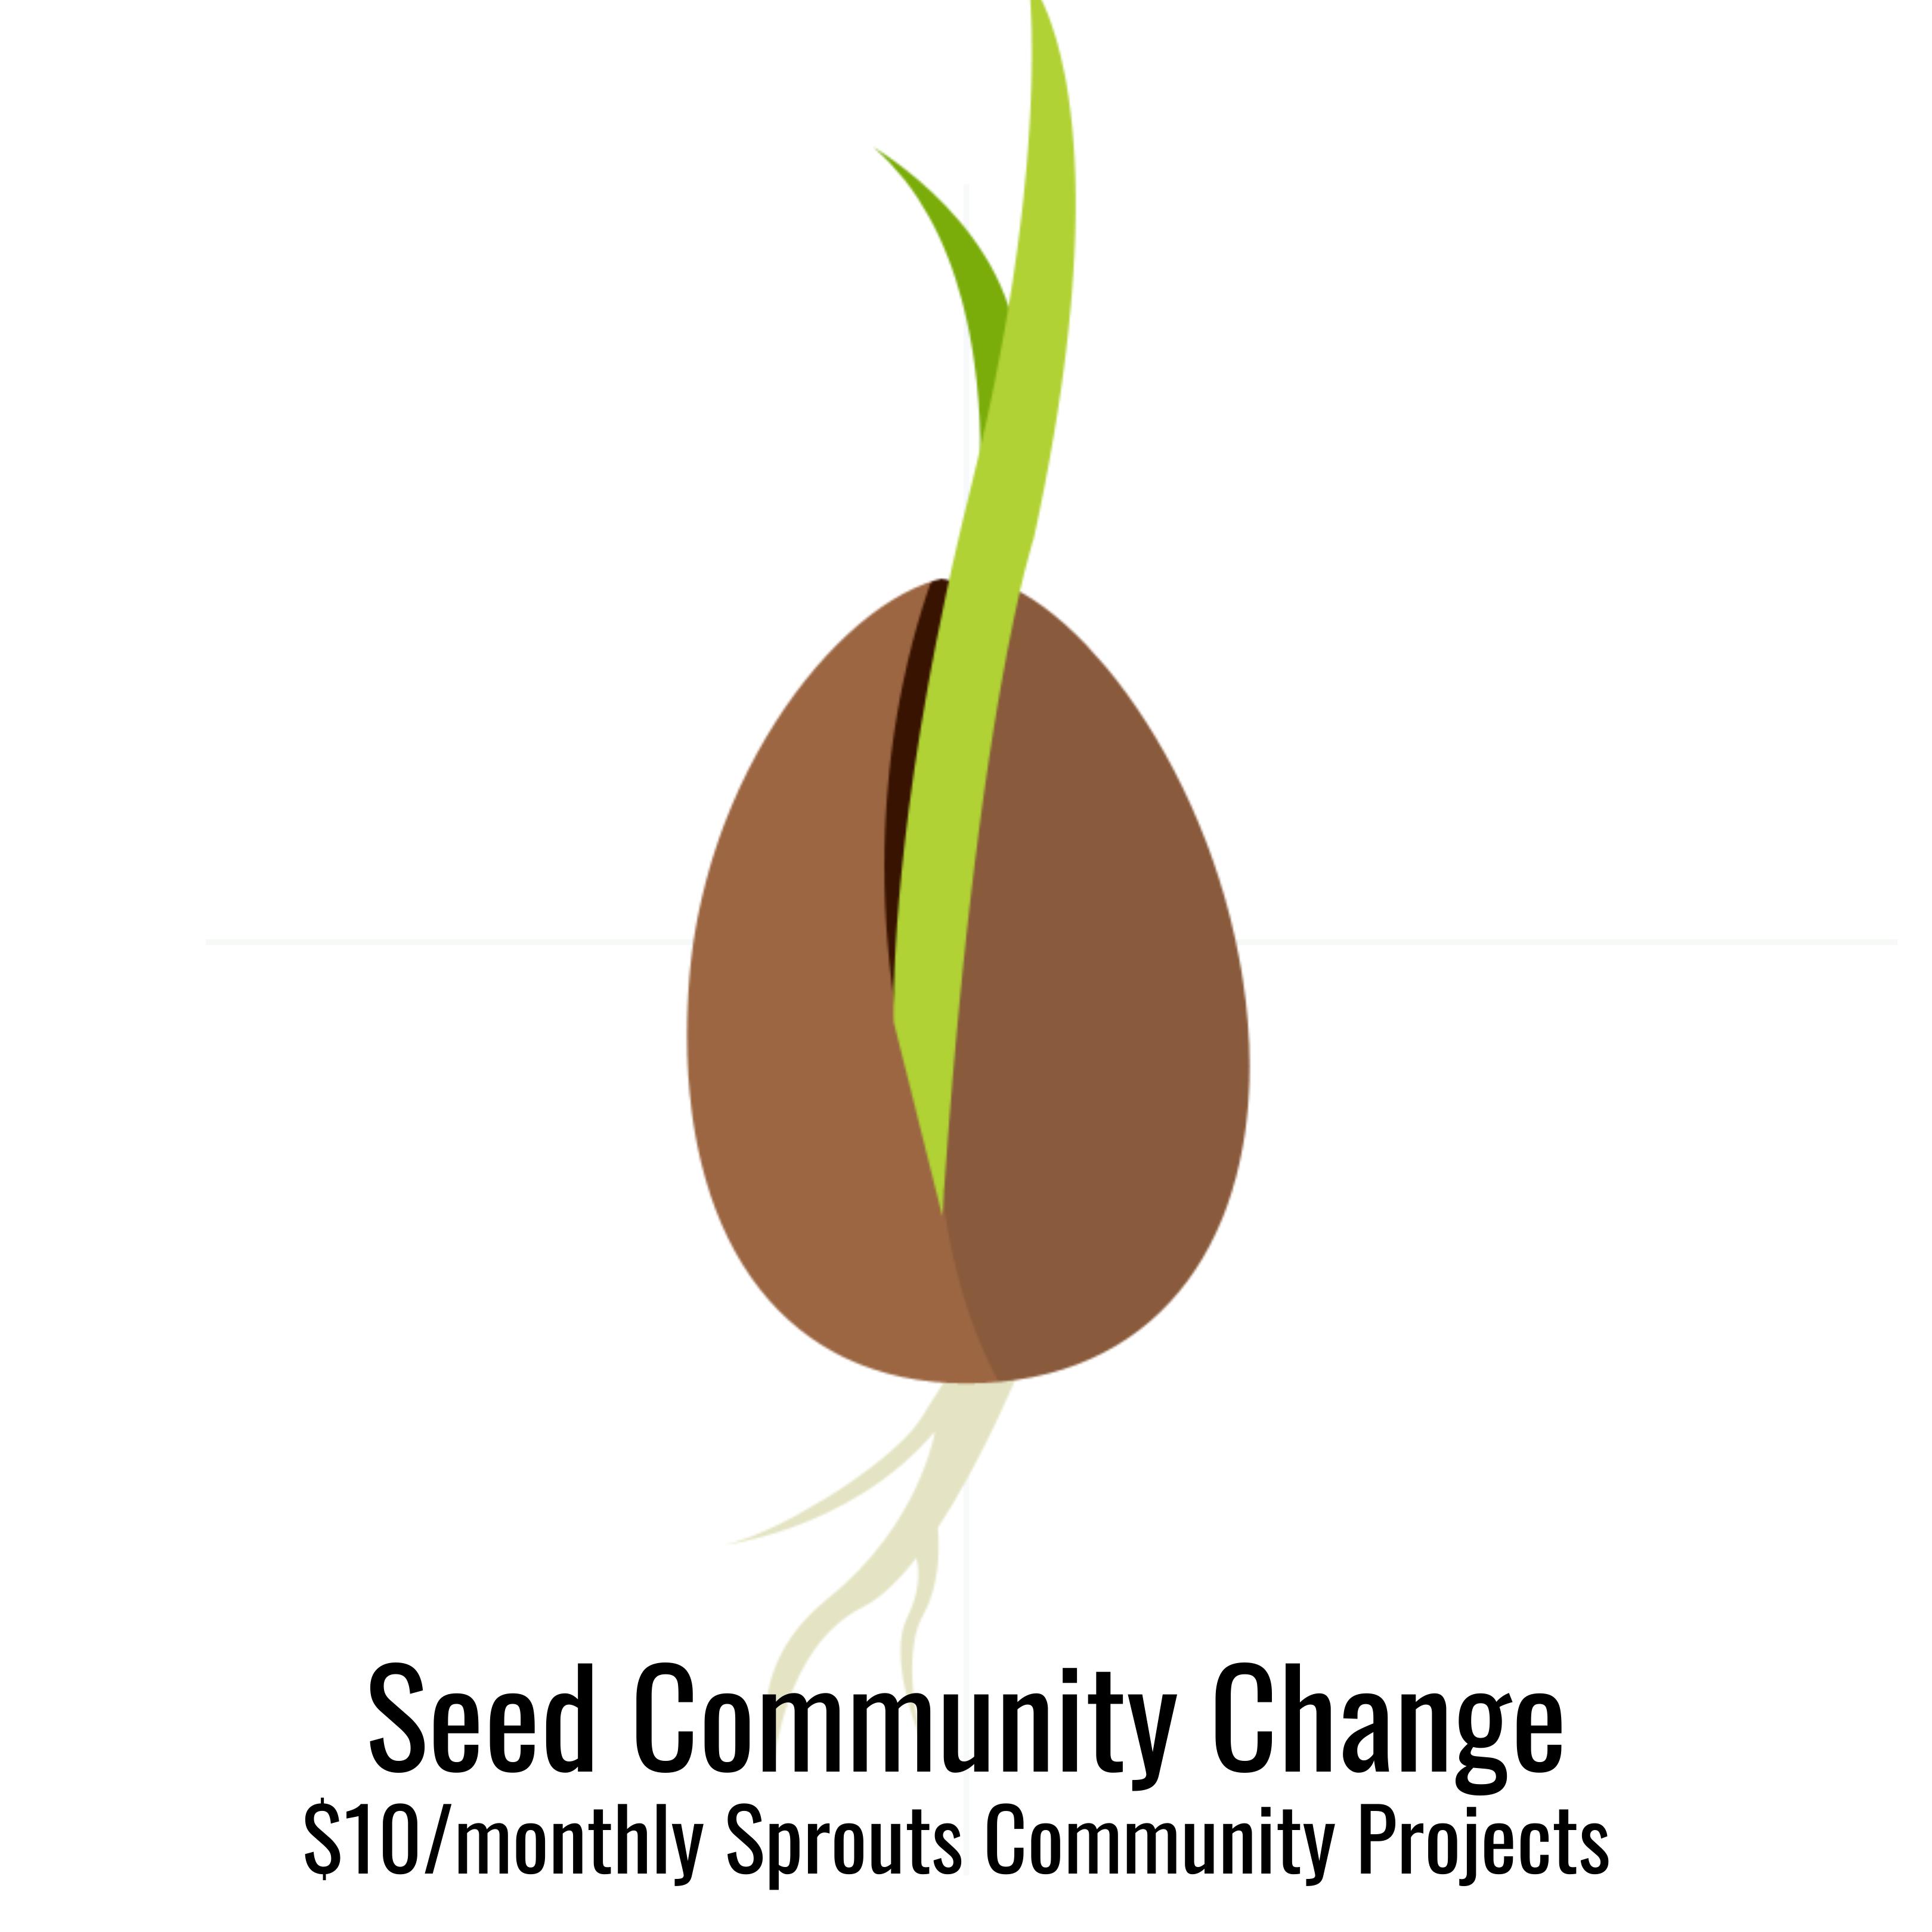 Seed Community Change